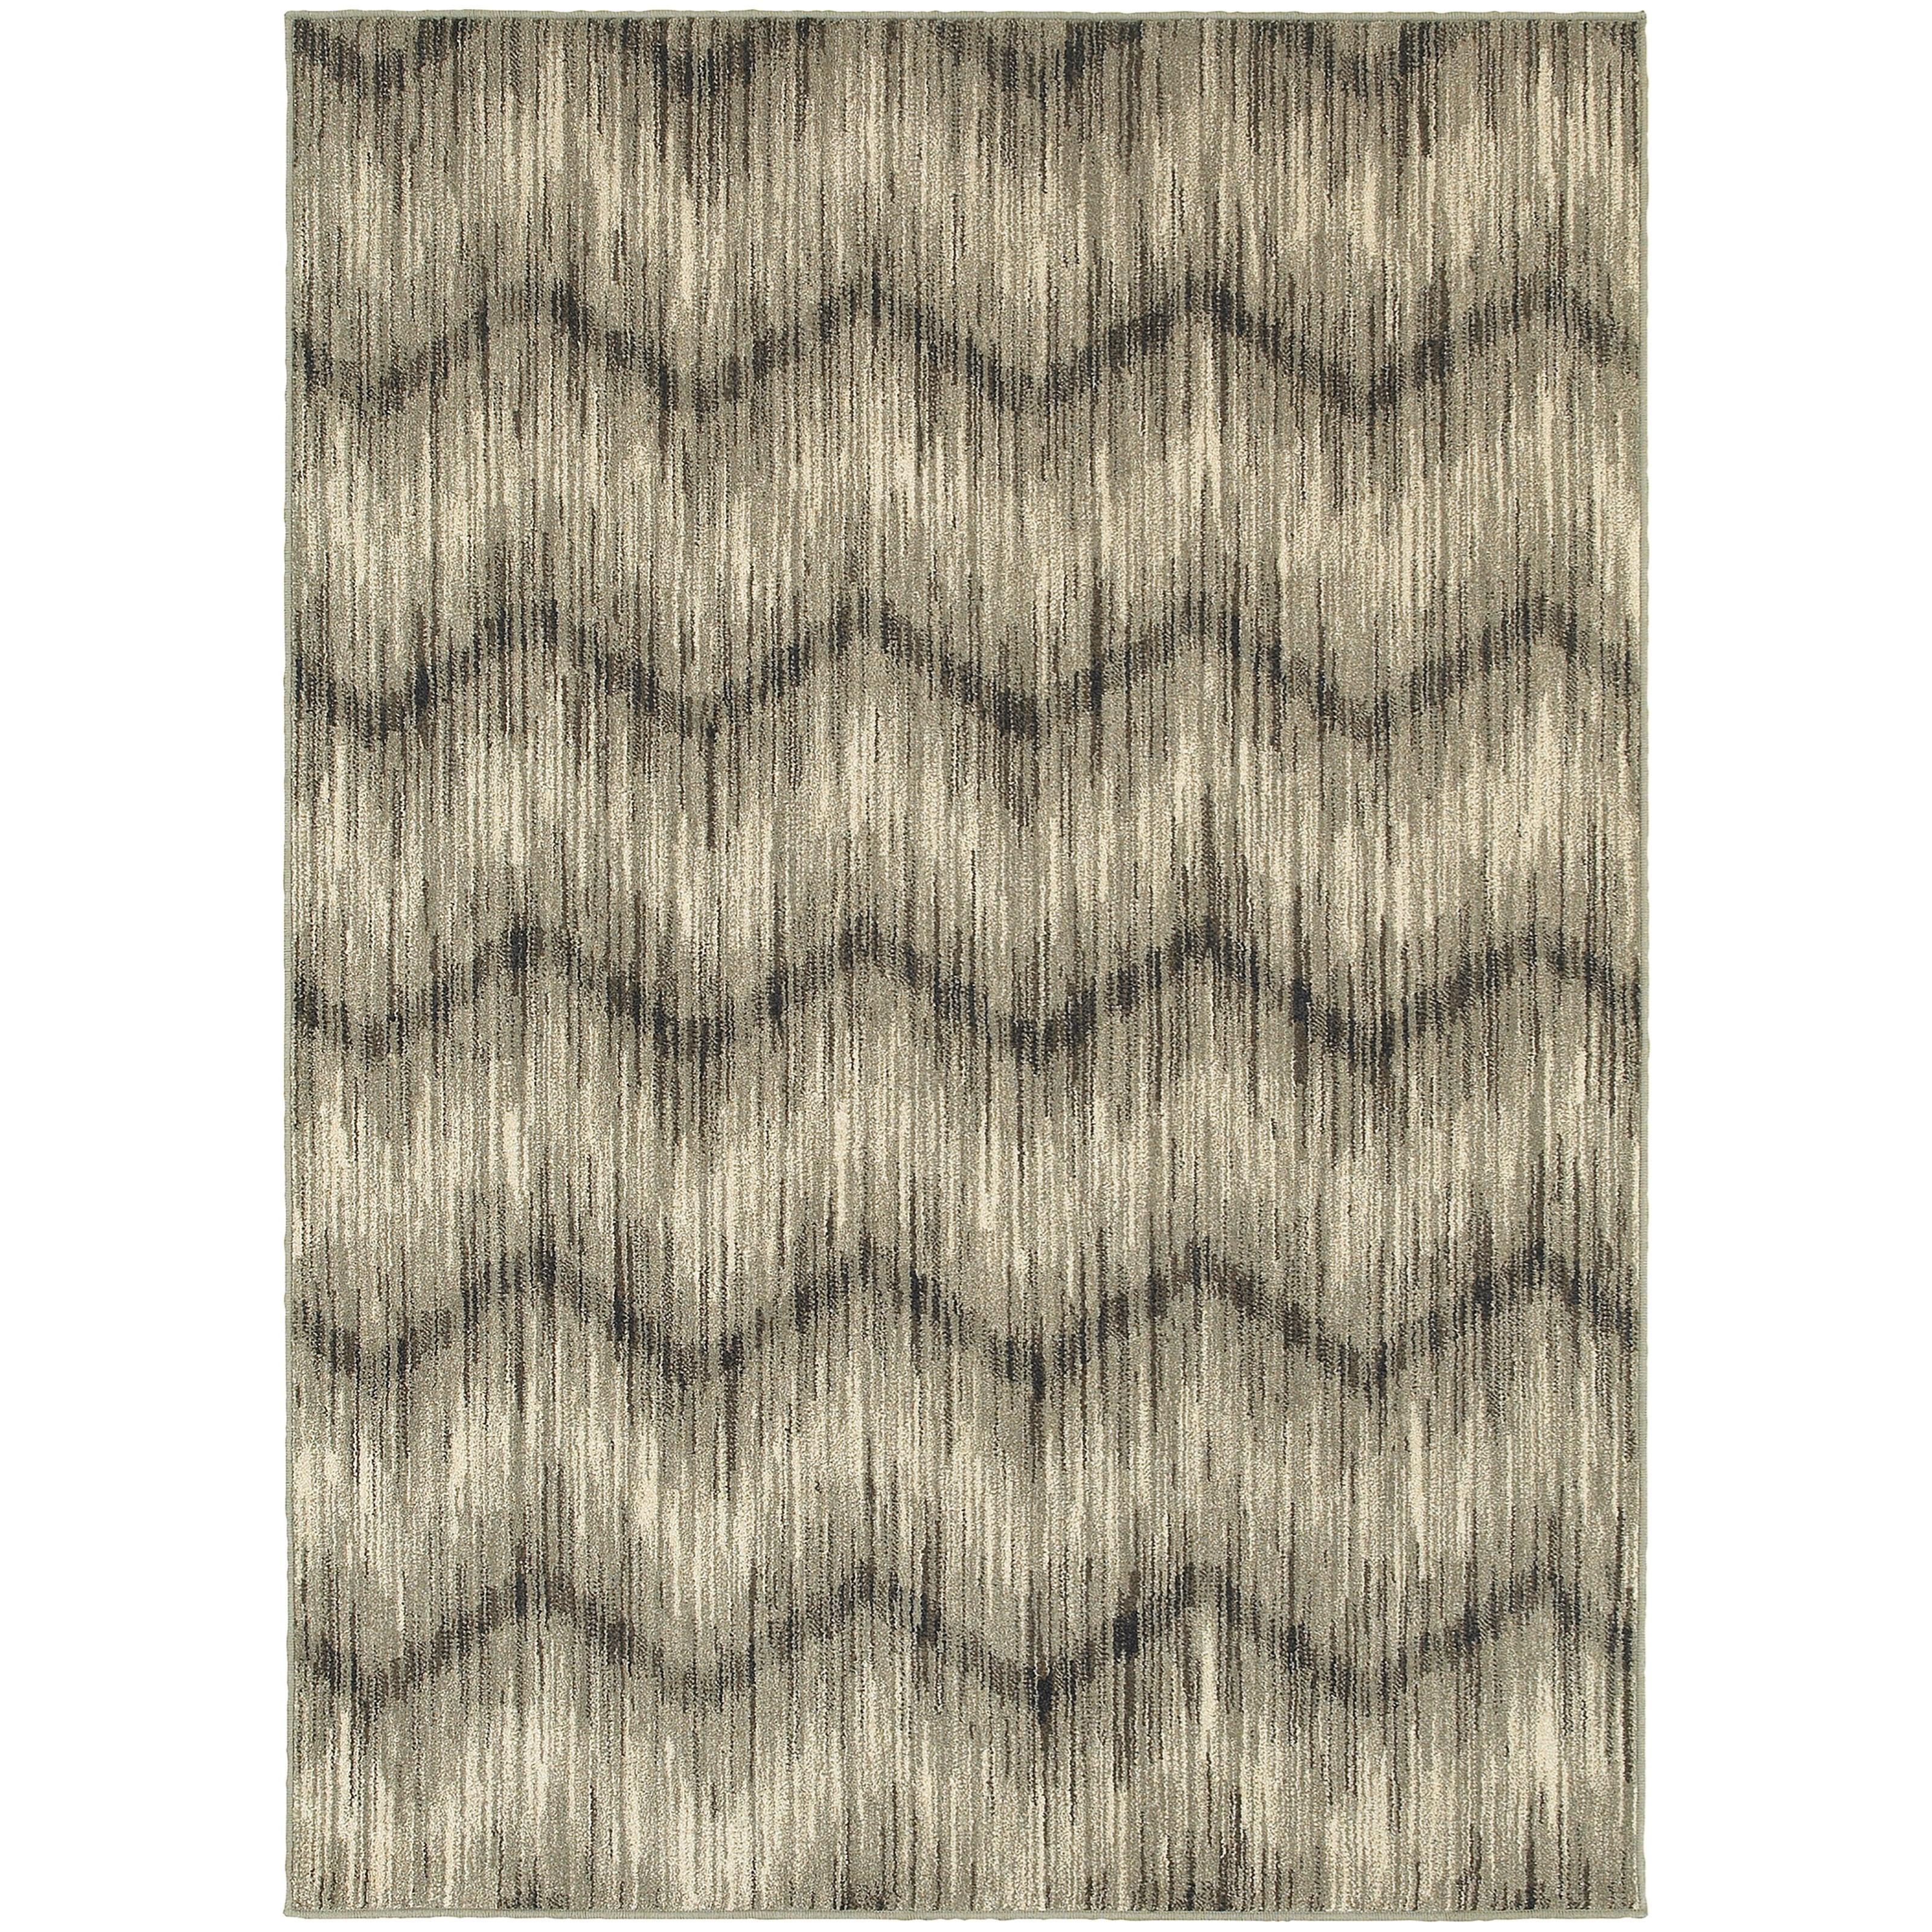 "Oriental Weavers Highlands 7'10"" X 10'10"" Rectangle Area Rug - Item Number: HIG6608A710X1010"